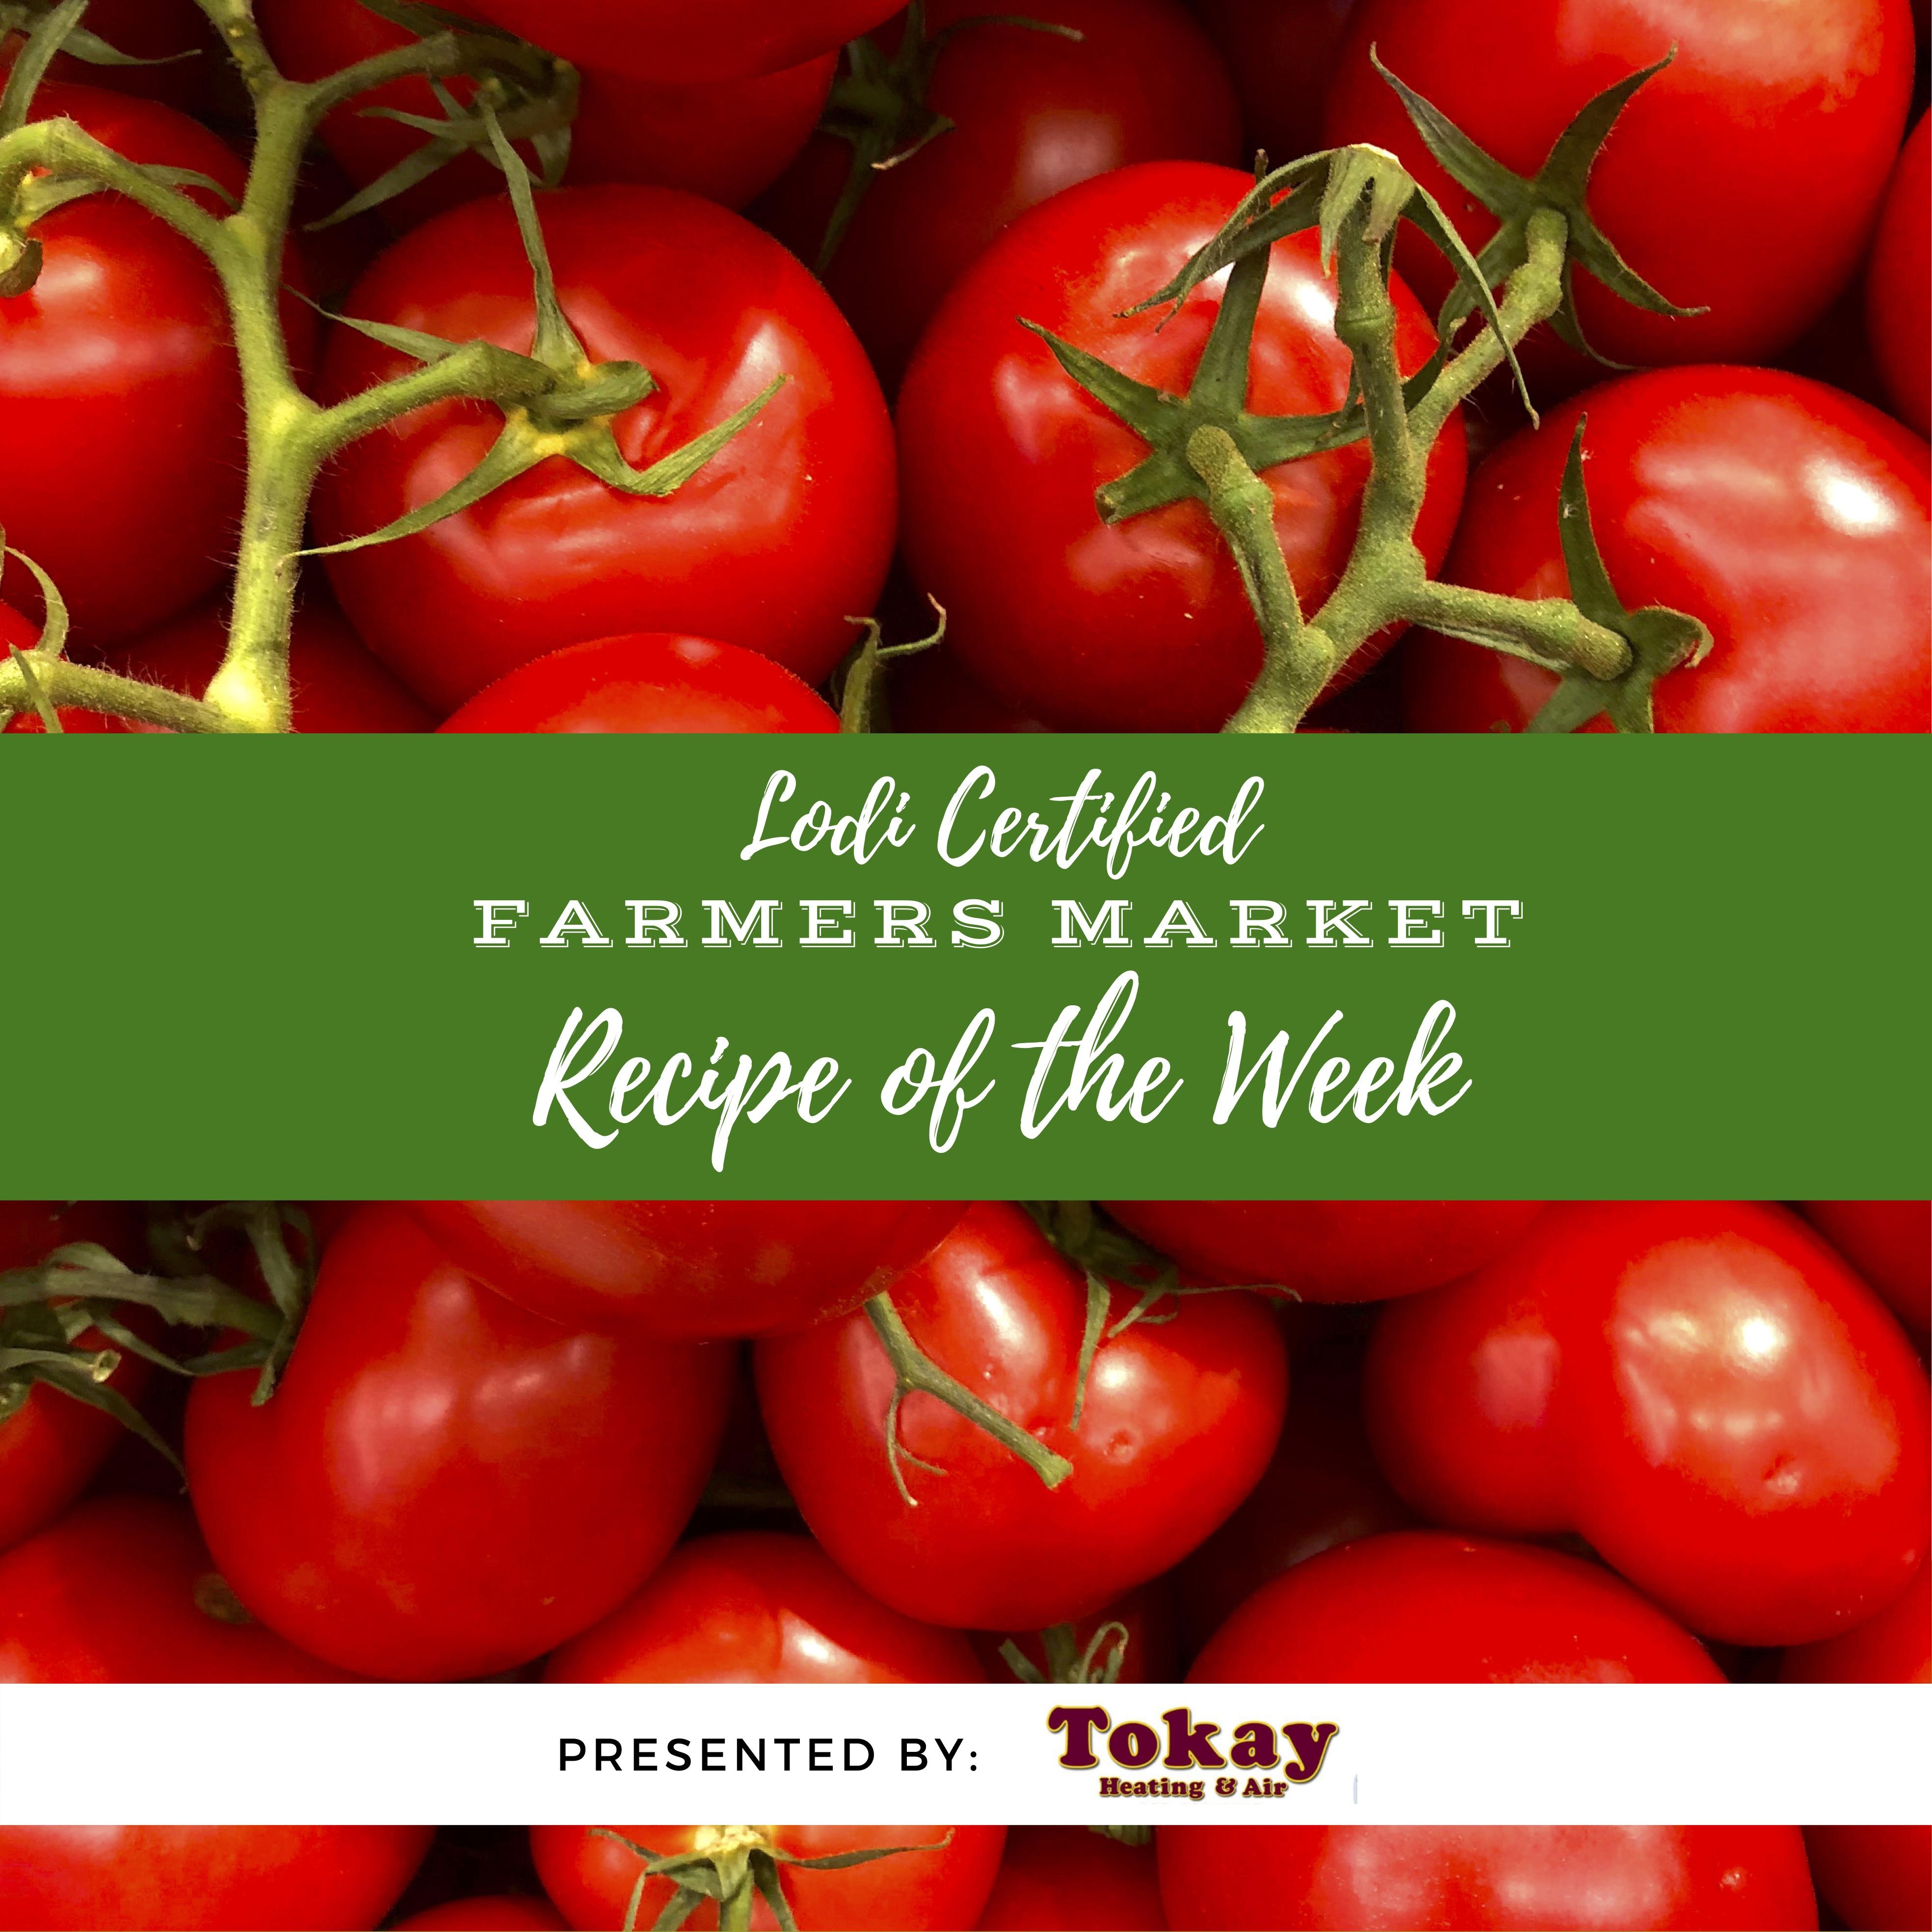 Recipe of the Week - Goat Cheese Stuffed Tomatoes